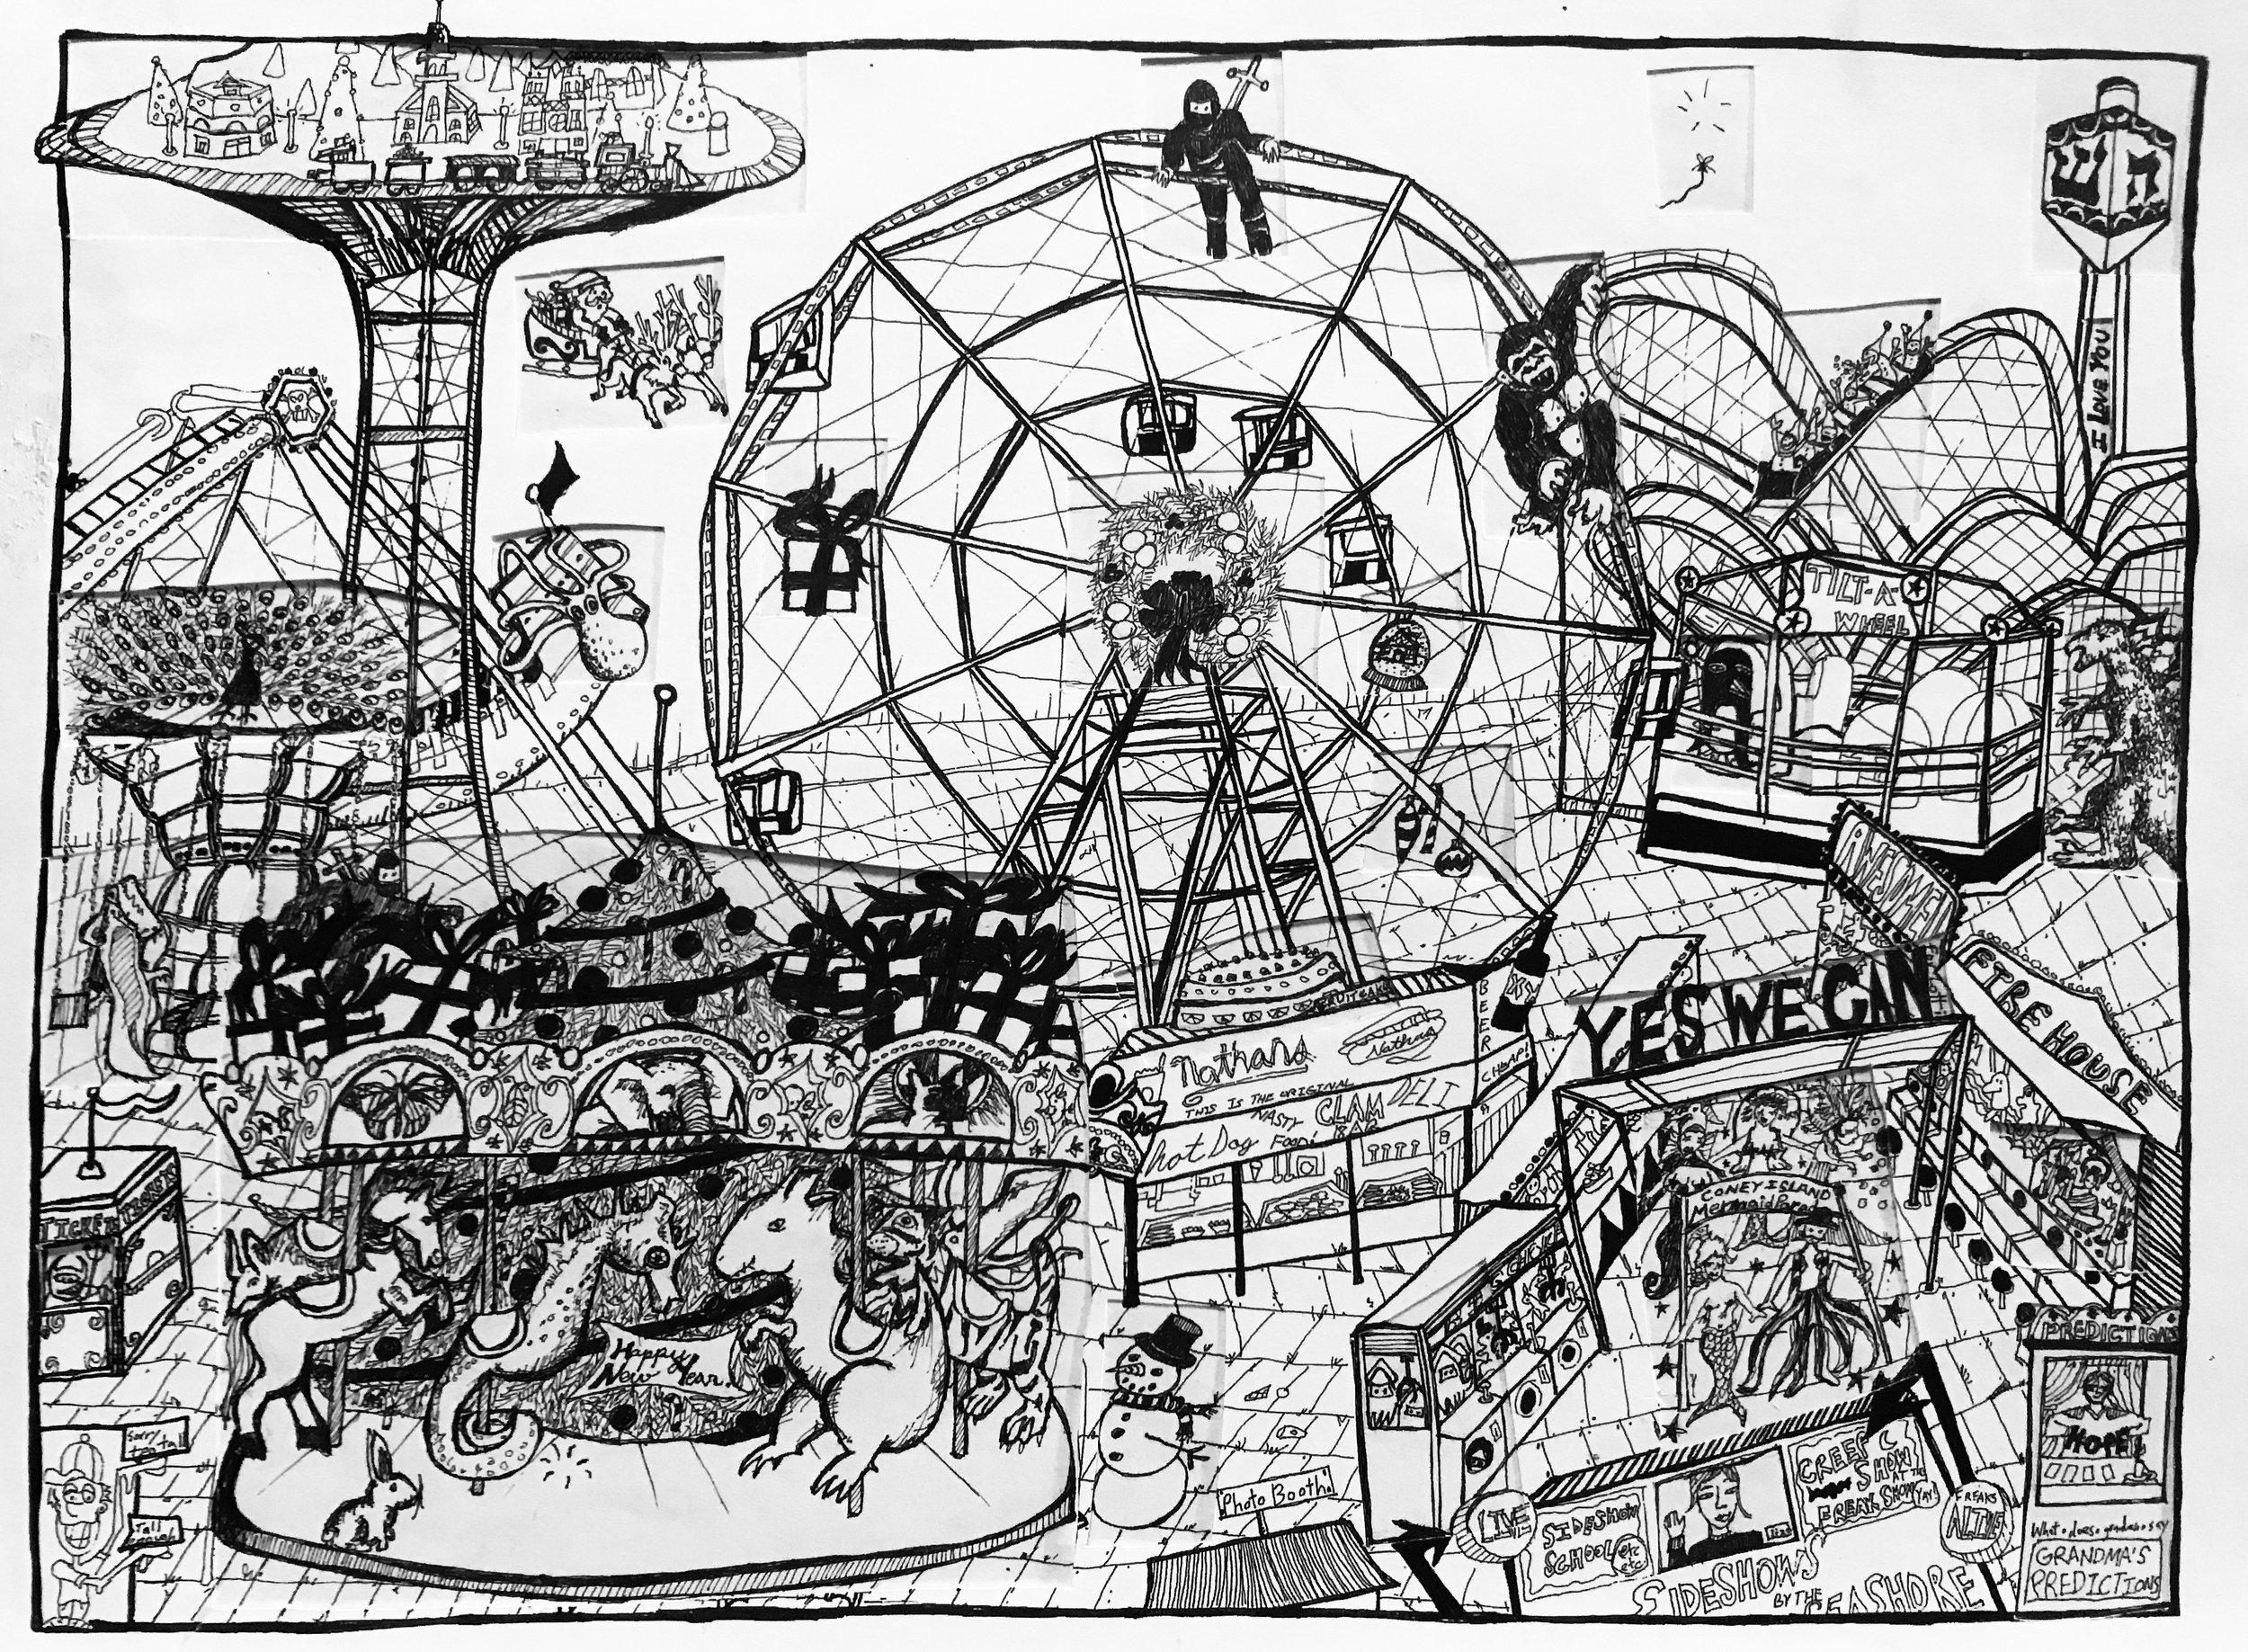 Advent Calendar (2008) / Underdrawing